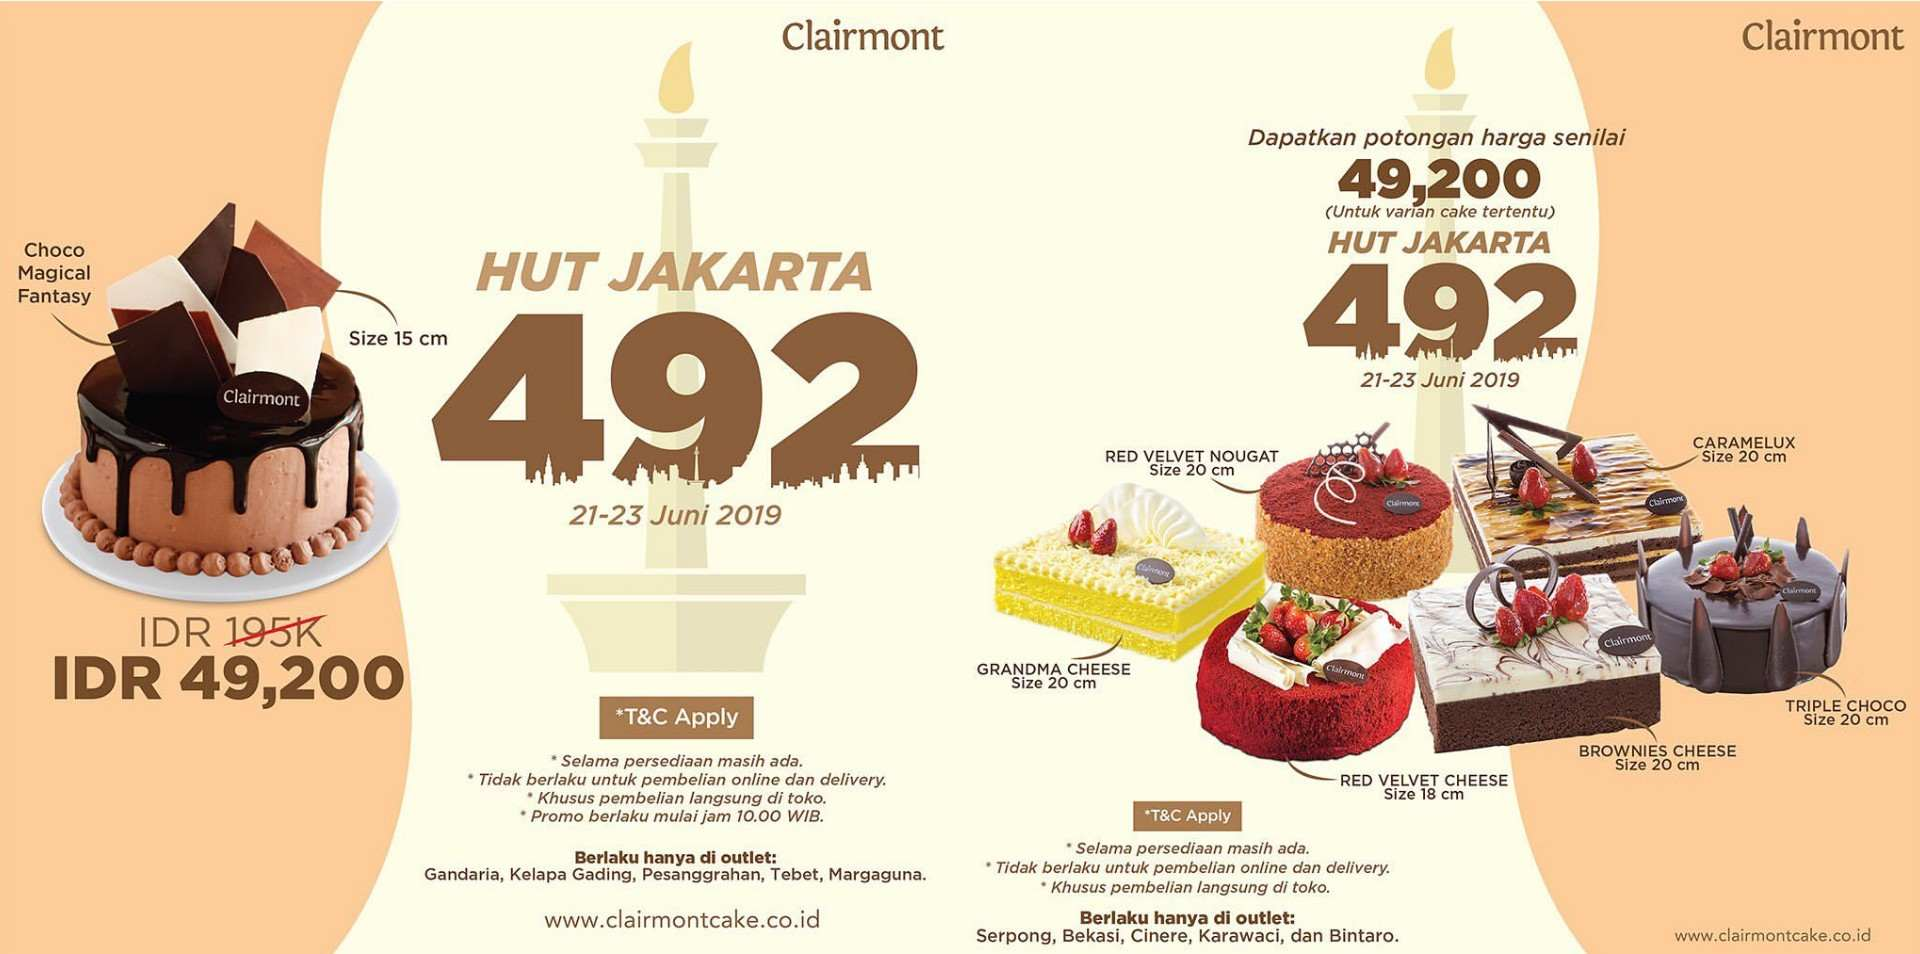 CLAIRMONT Promo SPESIAL HUT JAKARTA Ke-492